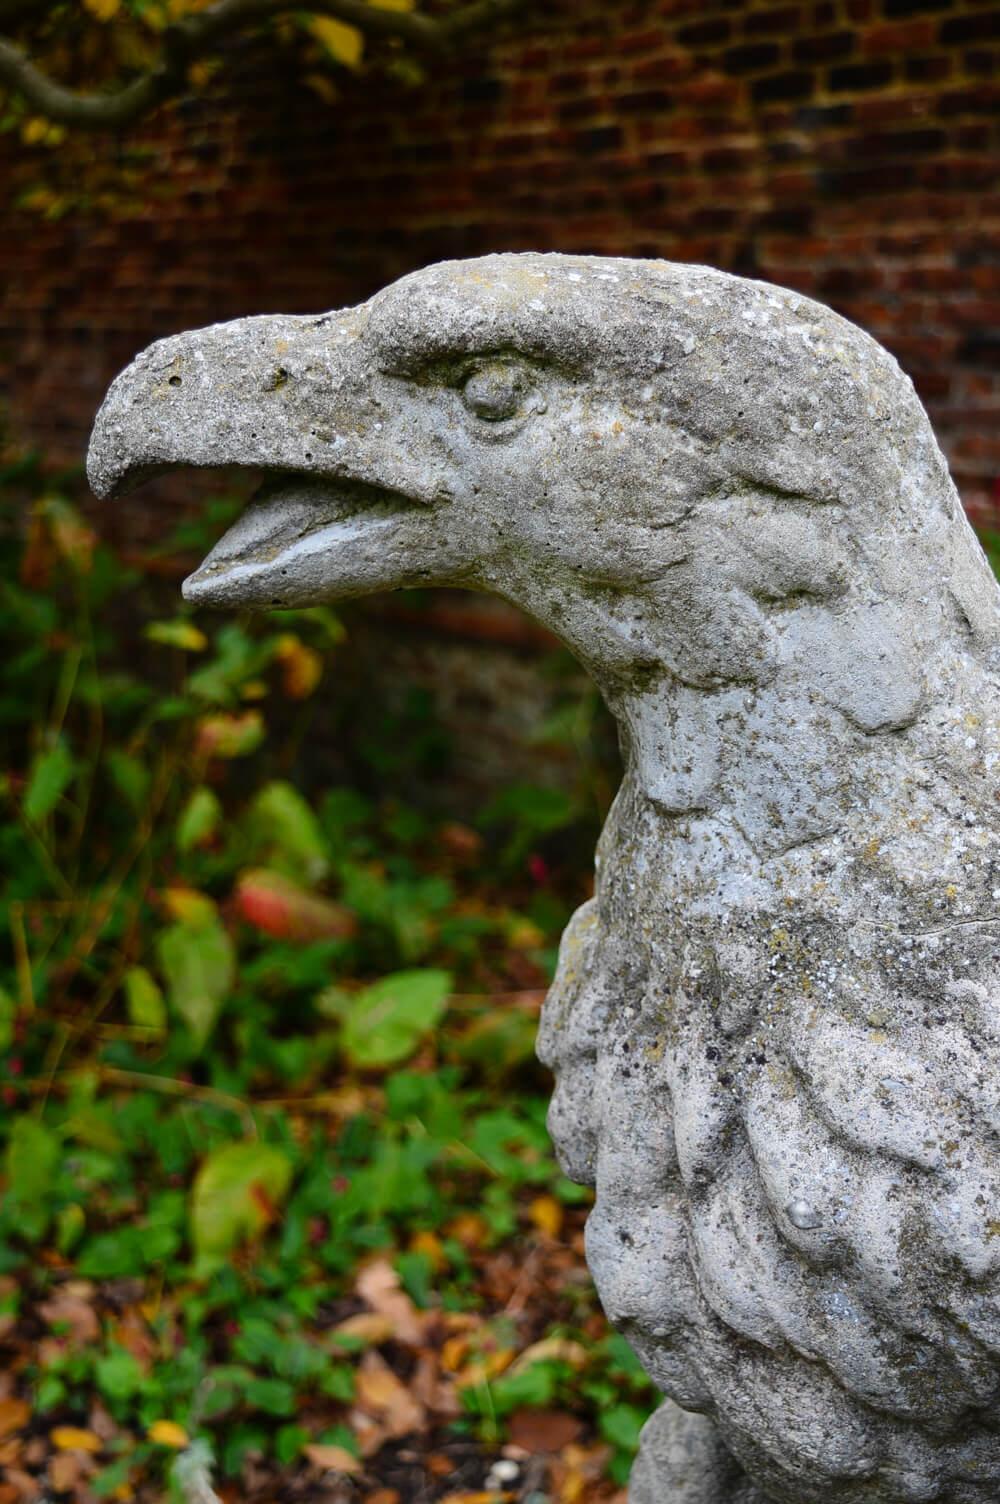 Statue at Waterlow Park, Hampstead, London